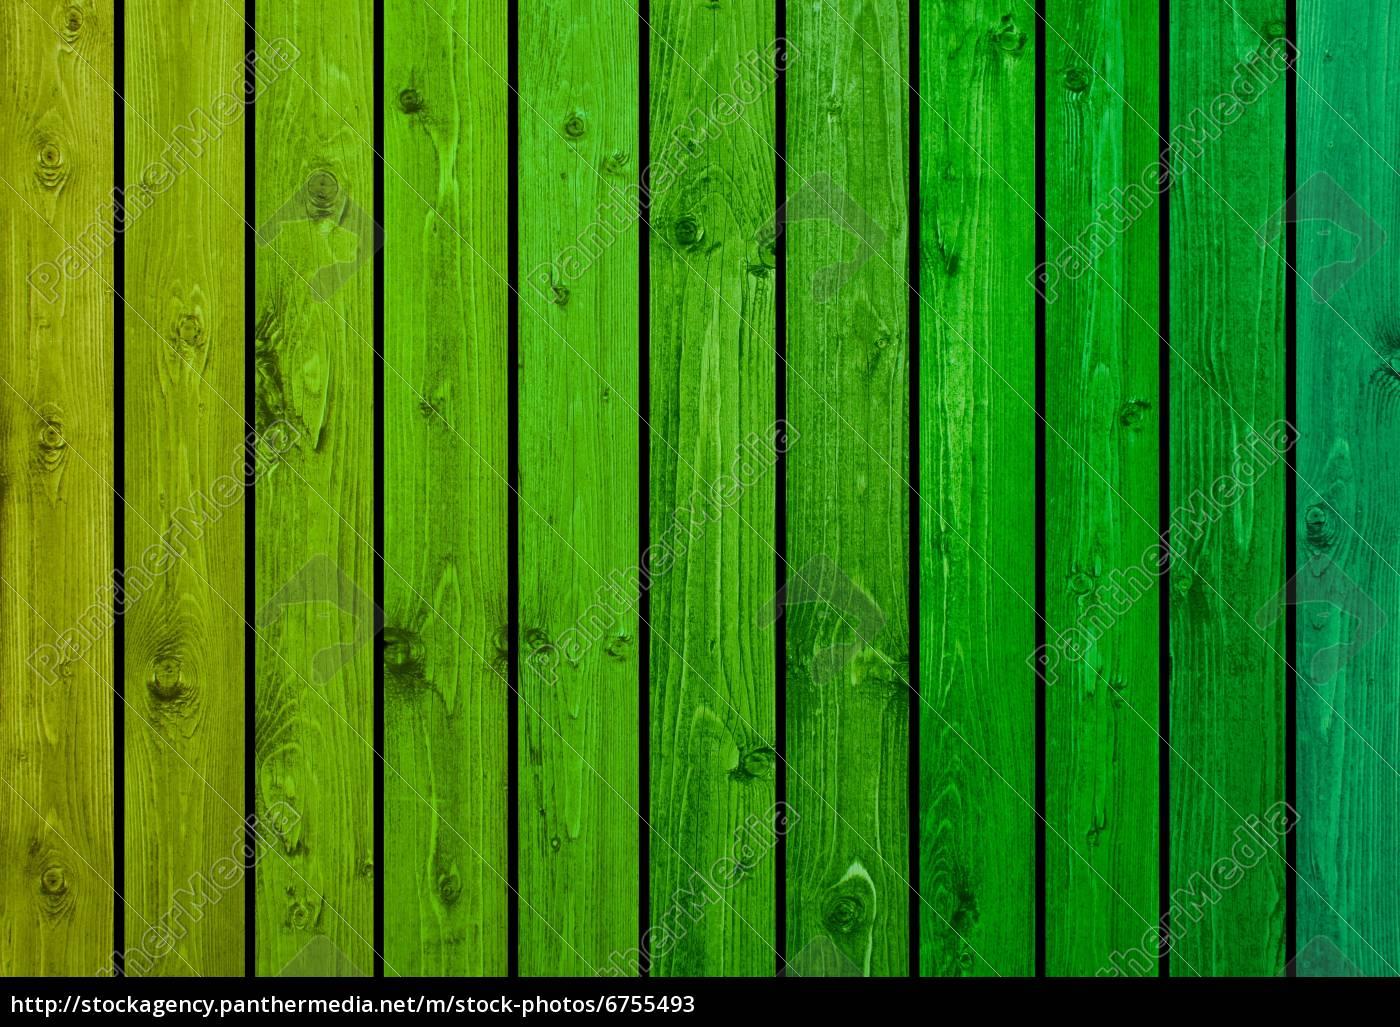 Wood Panel Hintergrund Gr 252 Ne Holzwand Stockfoto 6755493